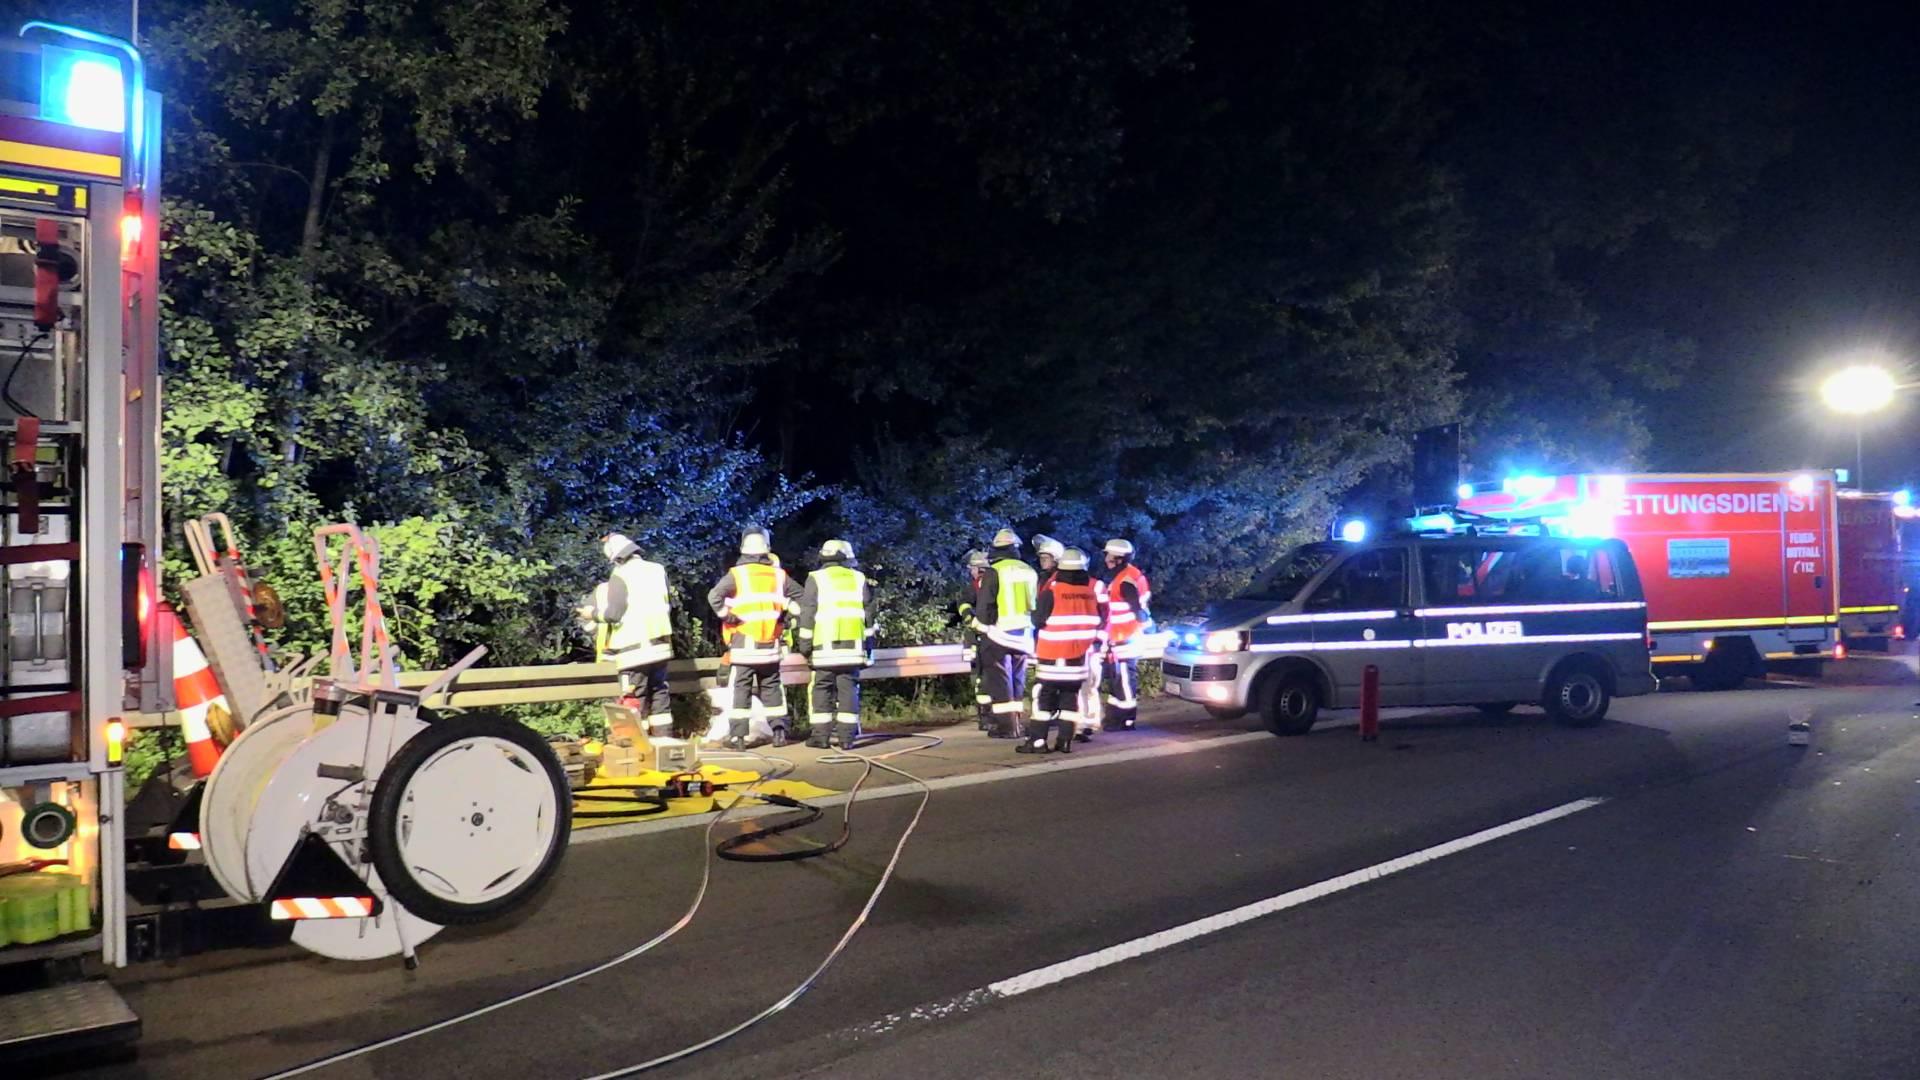 Unfall A59 Heute Düsseldorf